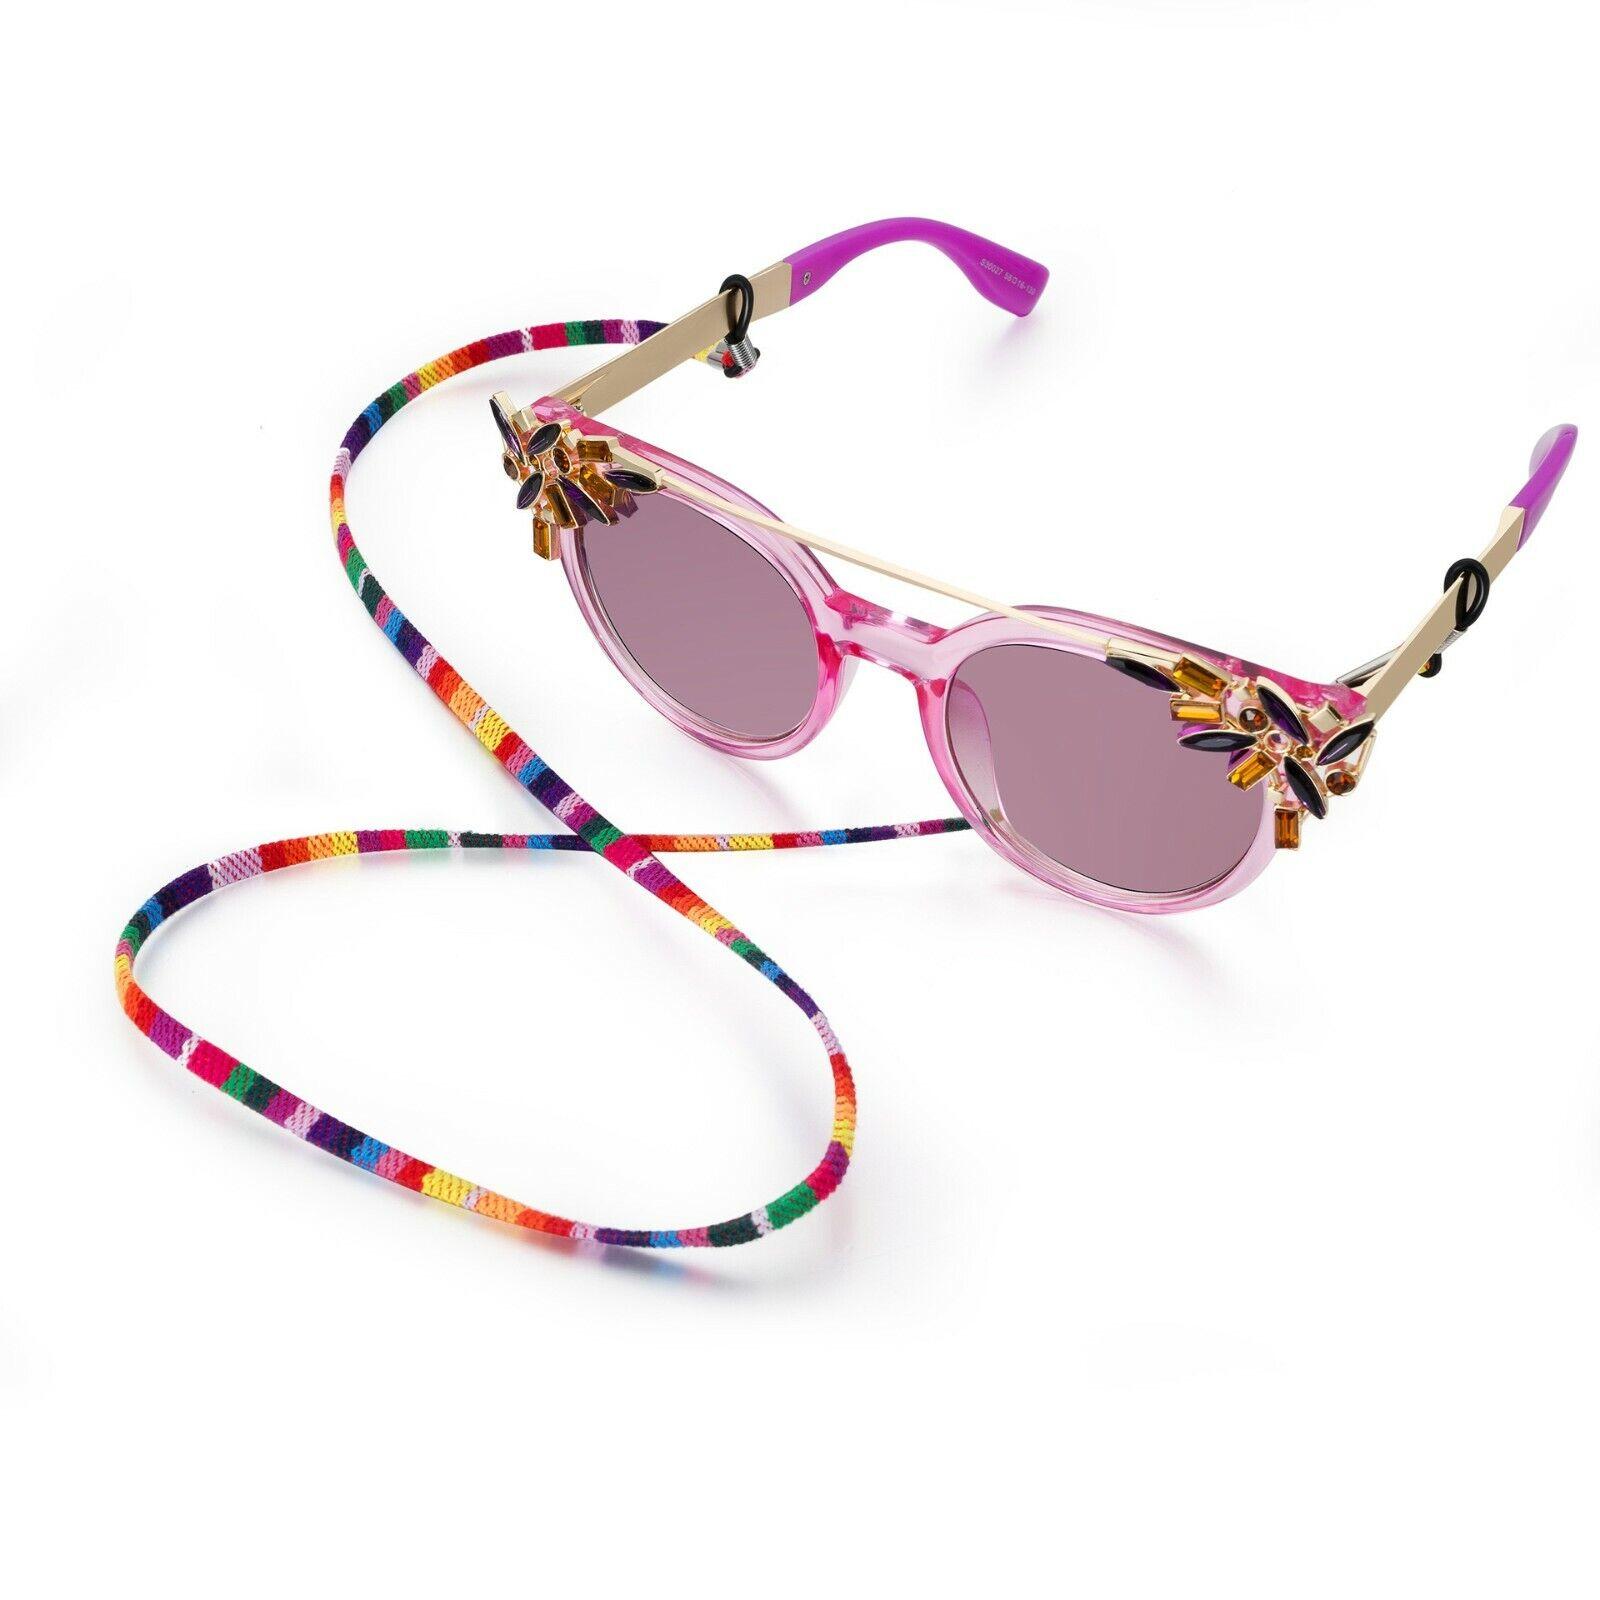 Sunglasses Neck Cord Strap Eyeglass Glasses String Lanyard Holder fashion  Rope Health & Beauty